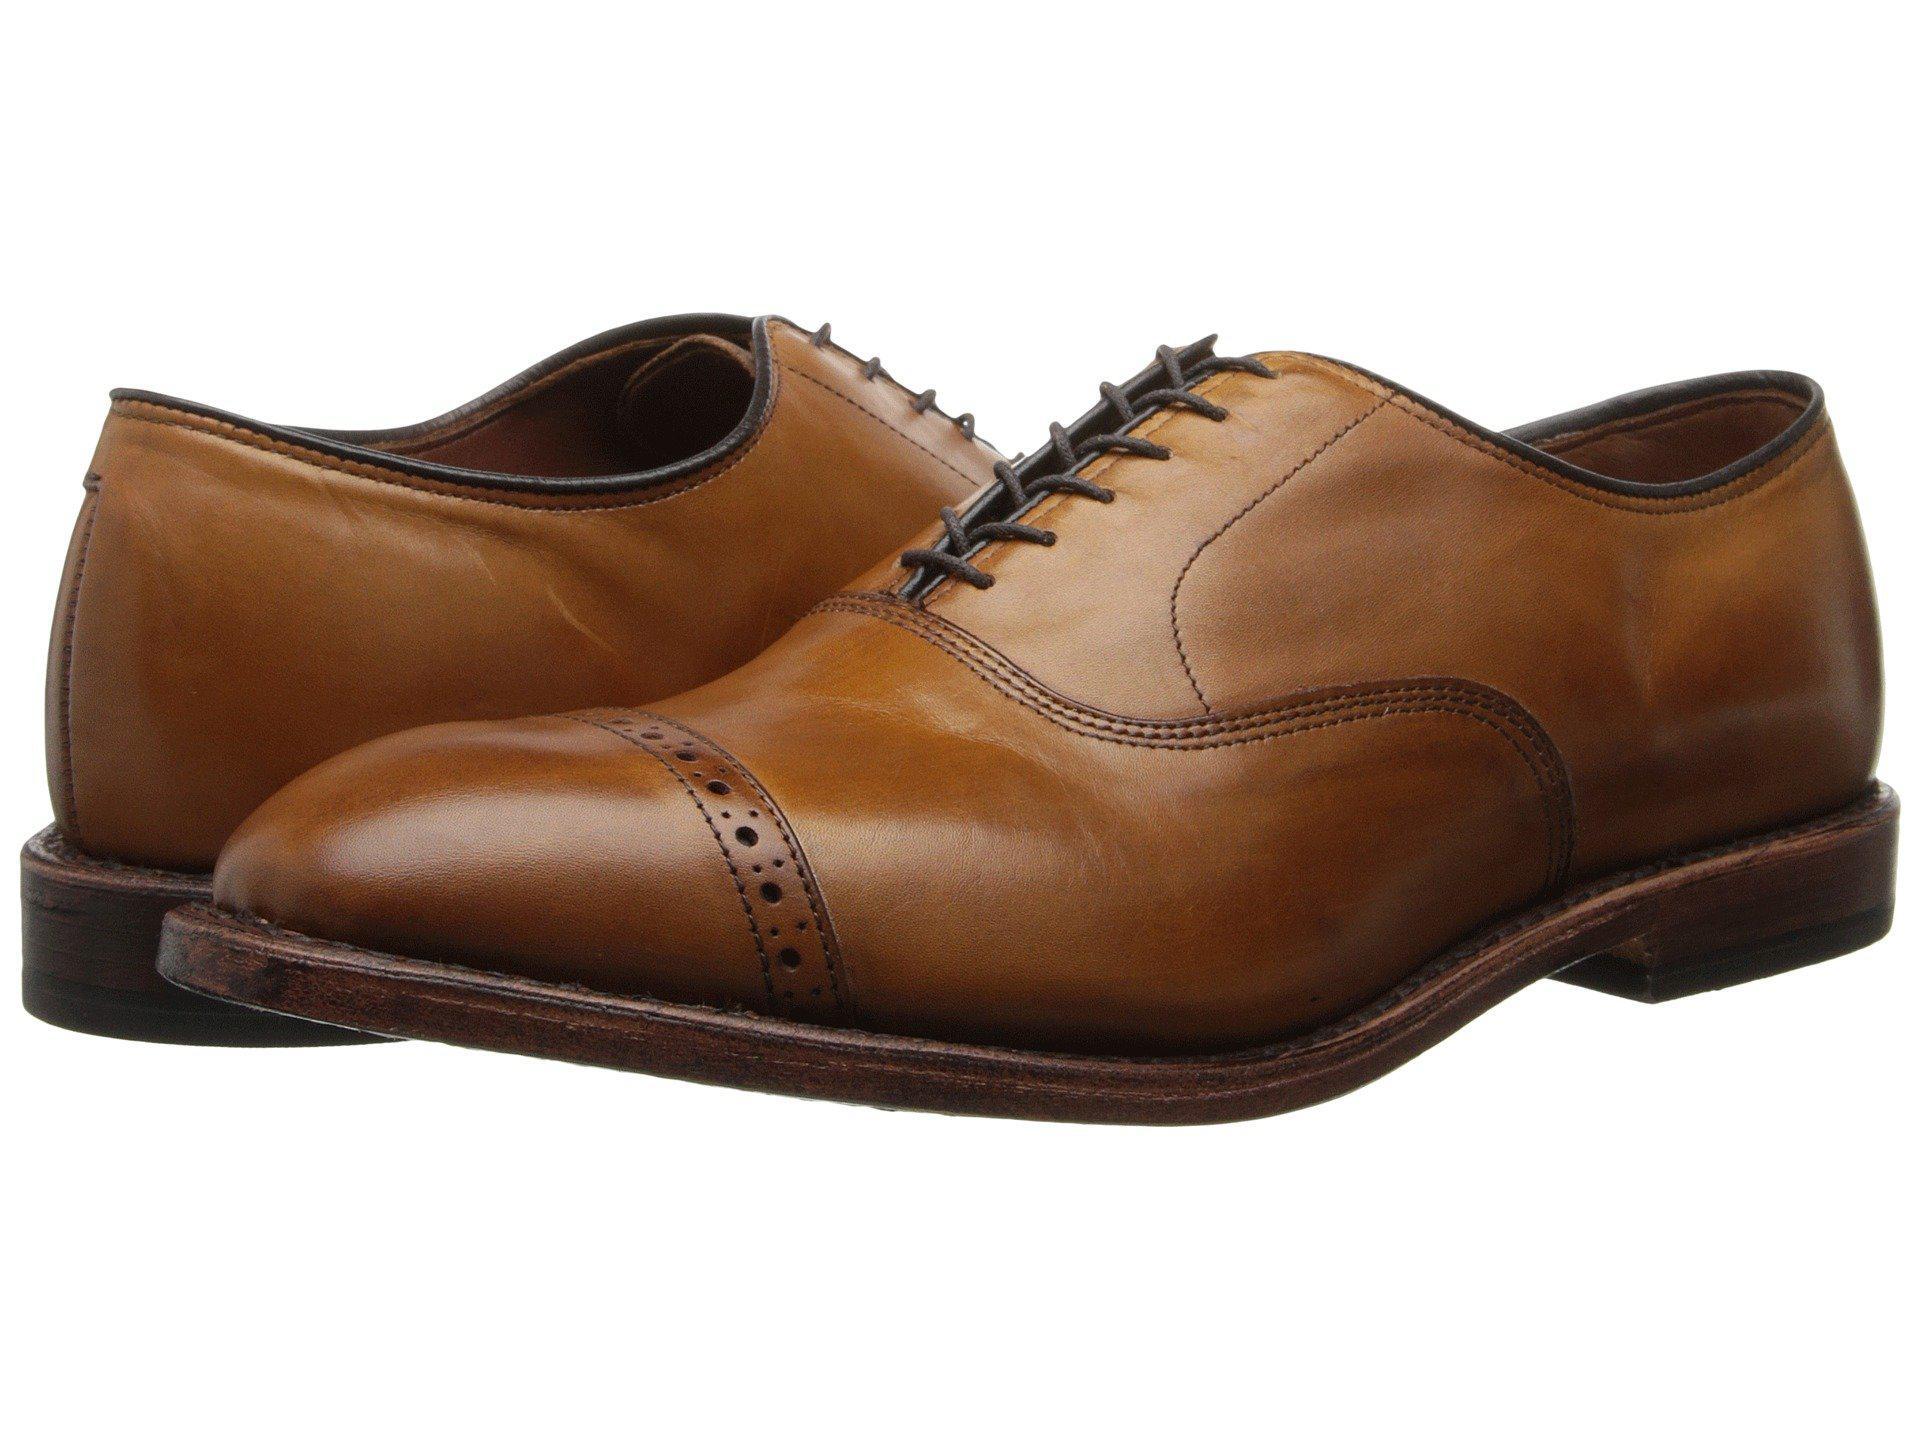 Lyst - Allen Edmonds Fifth Avenue (walnut Calf) Men s Lace Up Cap ... 950d59d1add